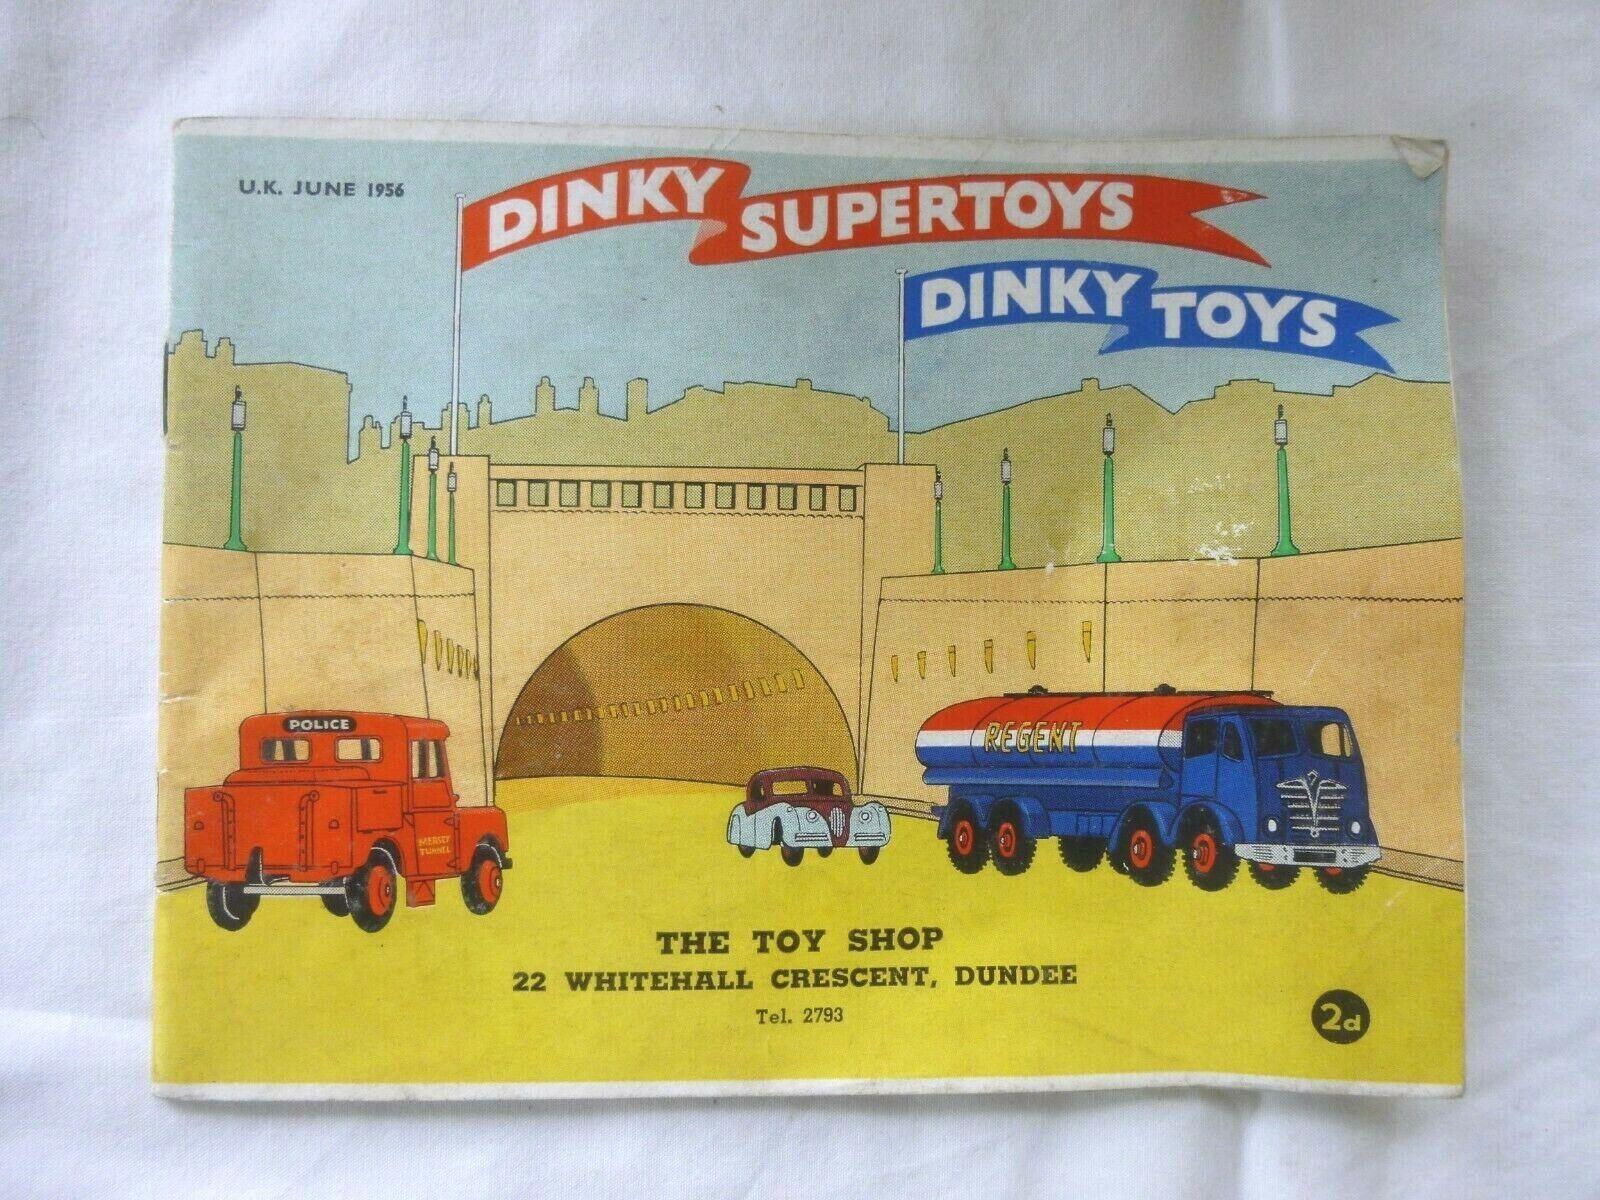 ORIGINAL DINKY & SUPERTOYS JUNE 1956 CATALOGUE [U.K. VERSION]